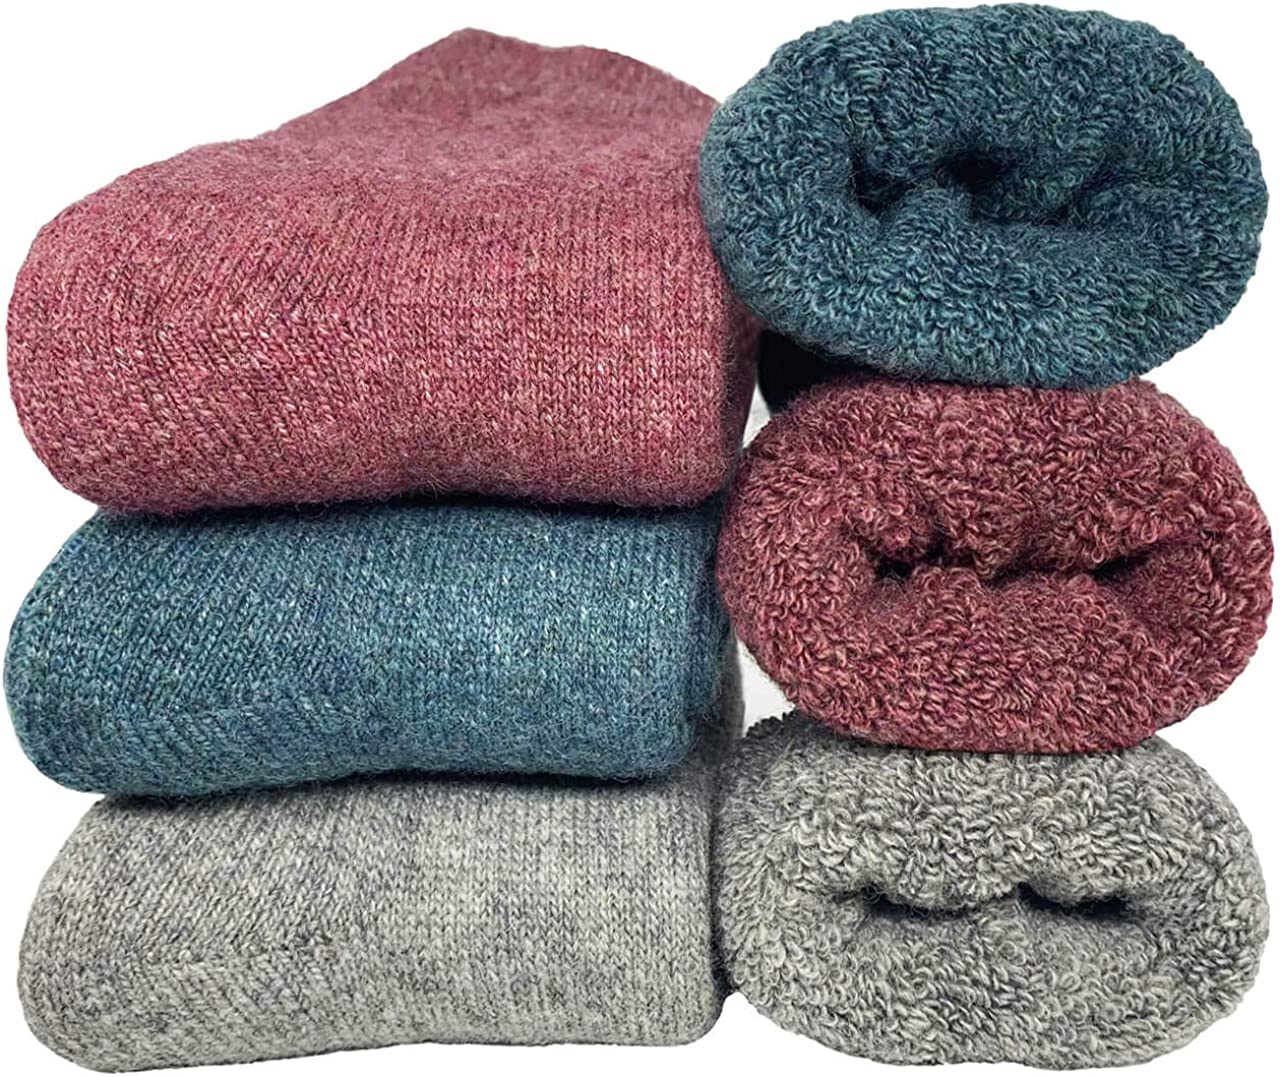 Mens Womens Winter Thick Wool Socks Super Soft Warm Cozy Knit Christmas Fuzzy Crew Socks 3 Pairs Pack